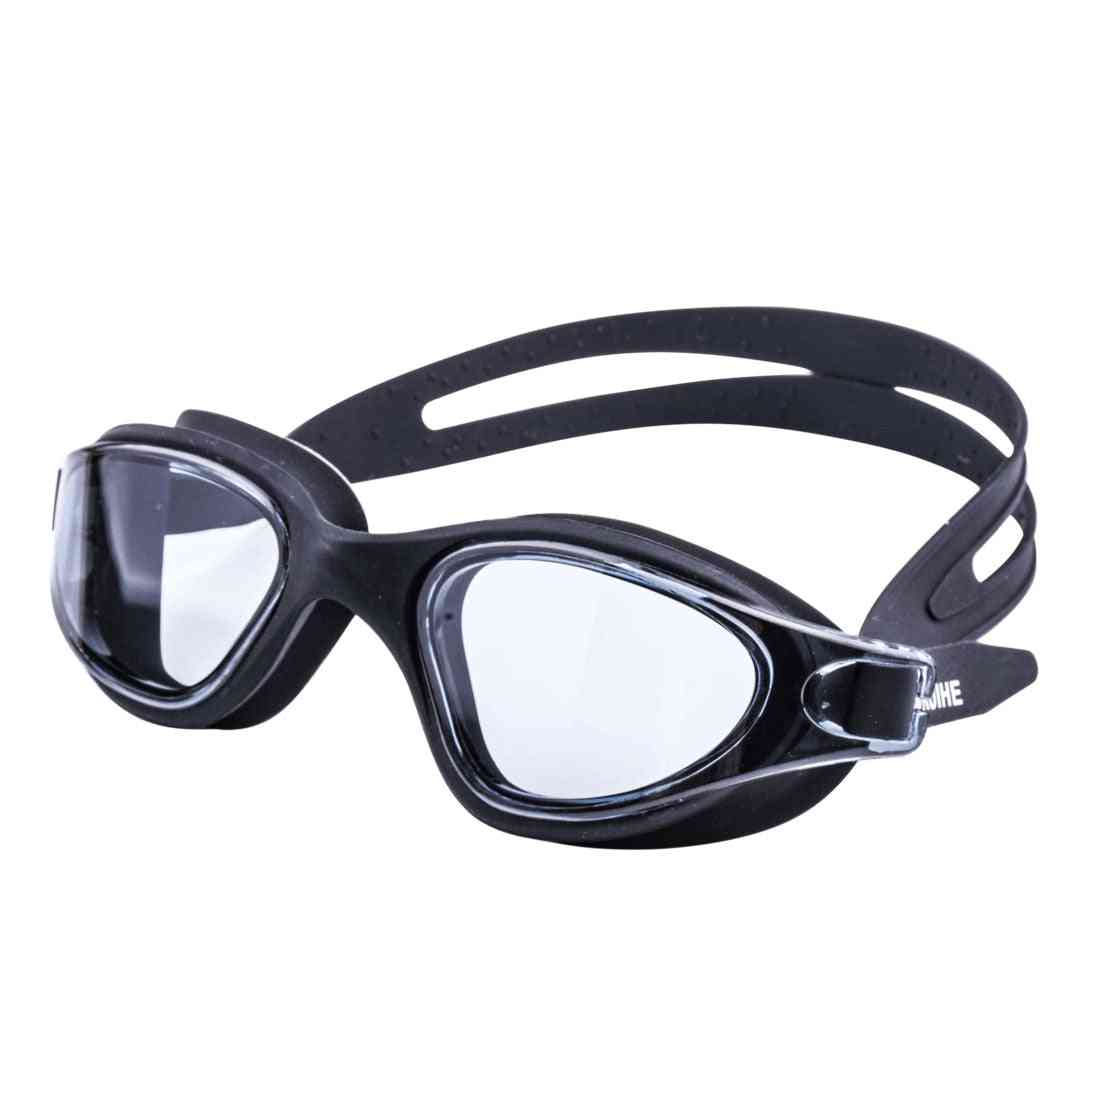 Swimming Glasses, Swim Goggles, Anti-fog, Uv Protection For Men, Women, Kids, Waterproof Silicone Diving Eyewear